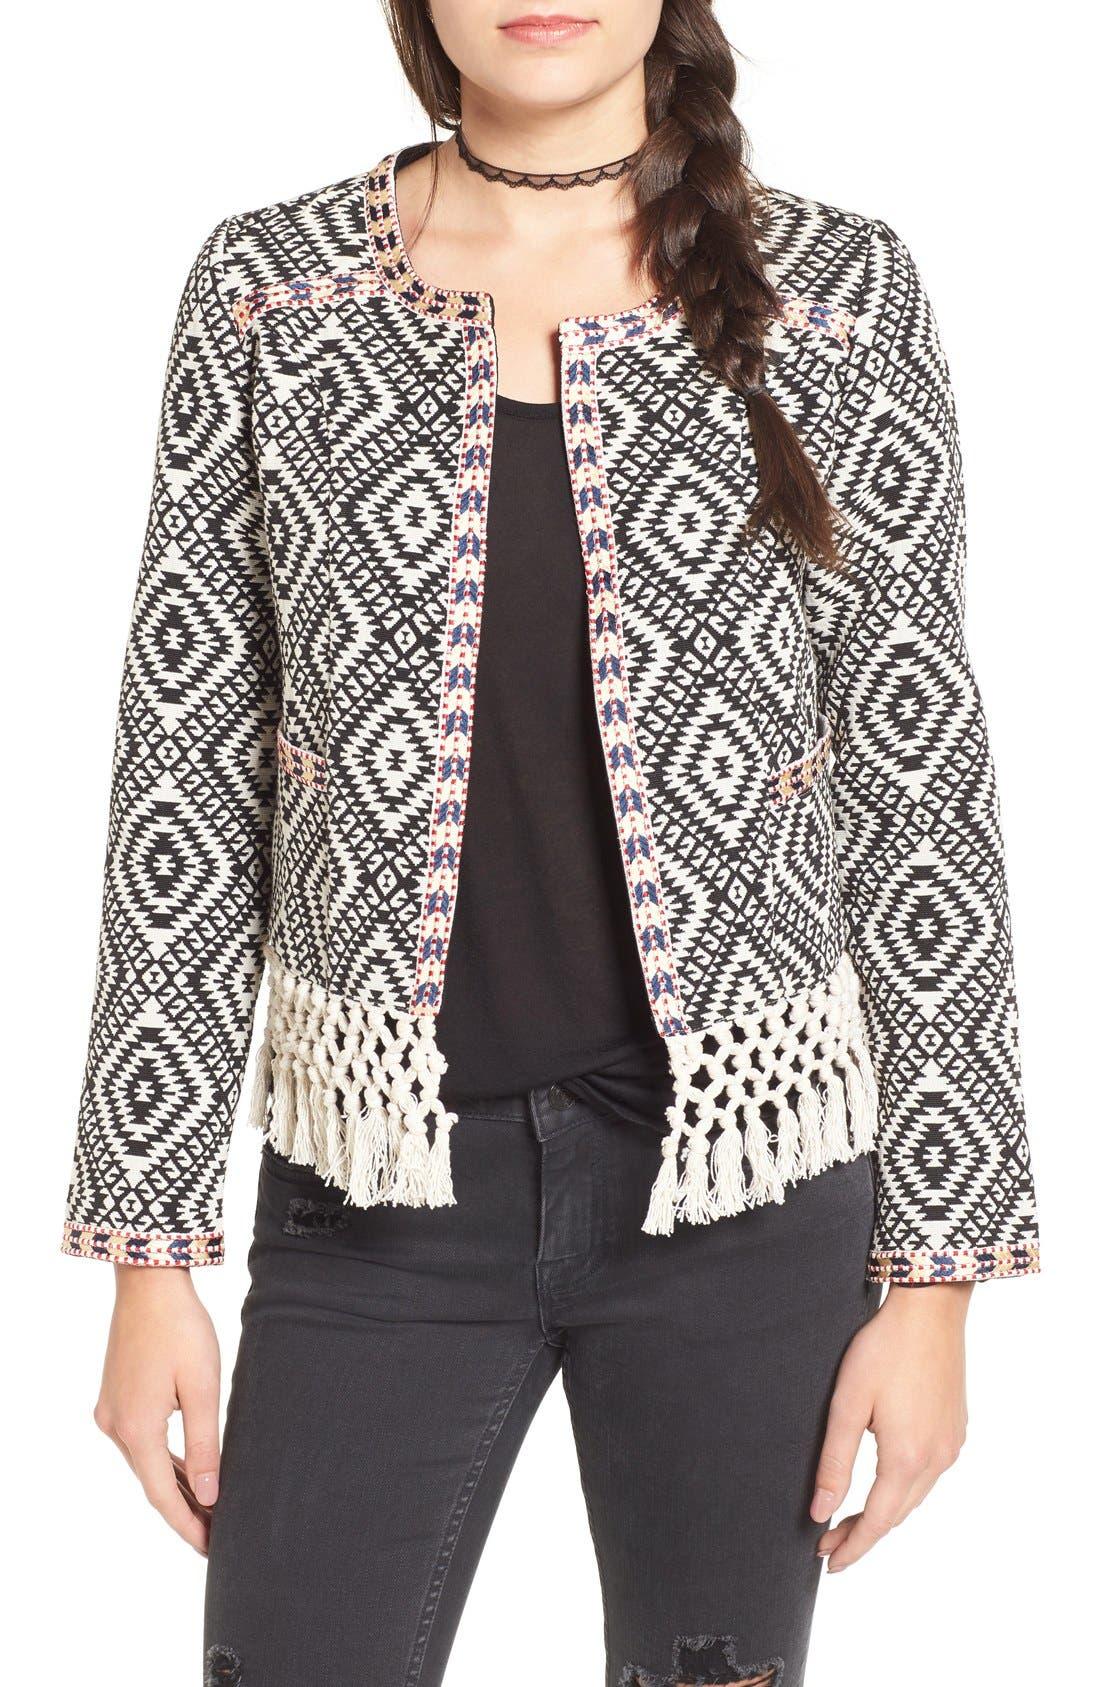 TULAROSA 'Santa Fe' Jacquard Jacket, Main, color, 001